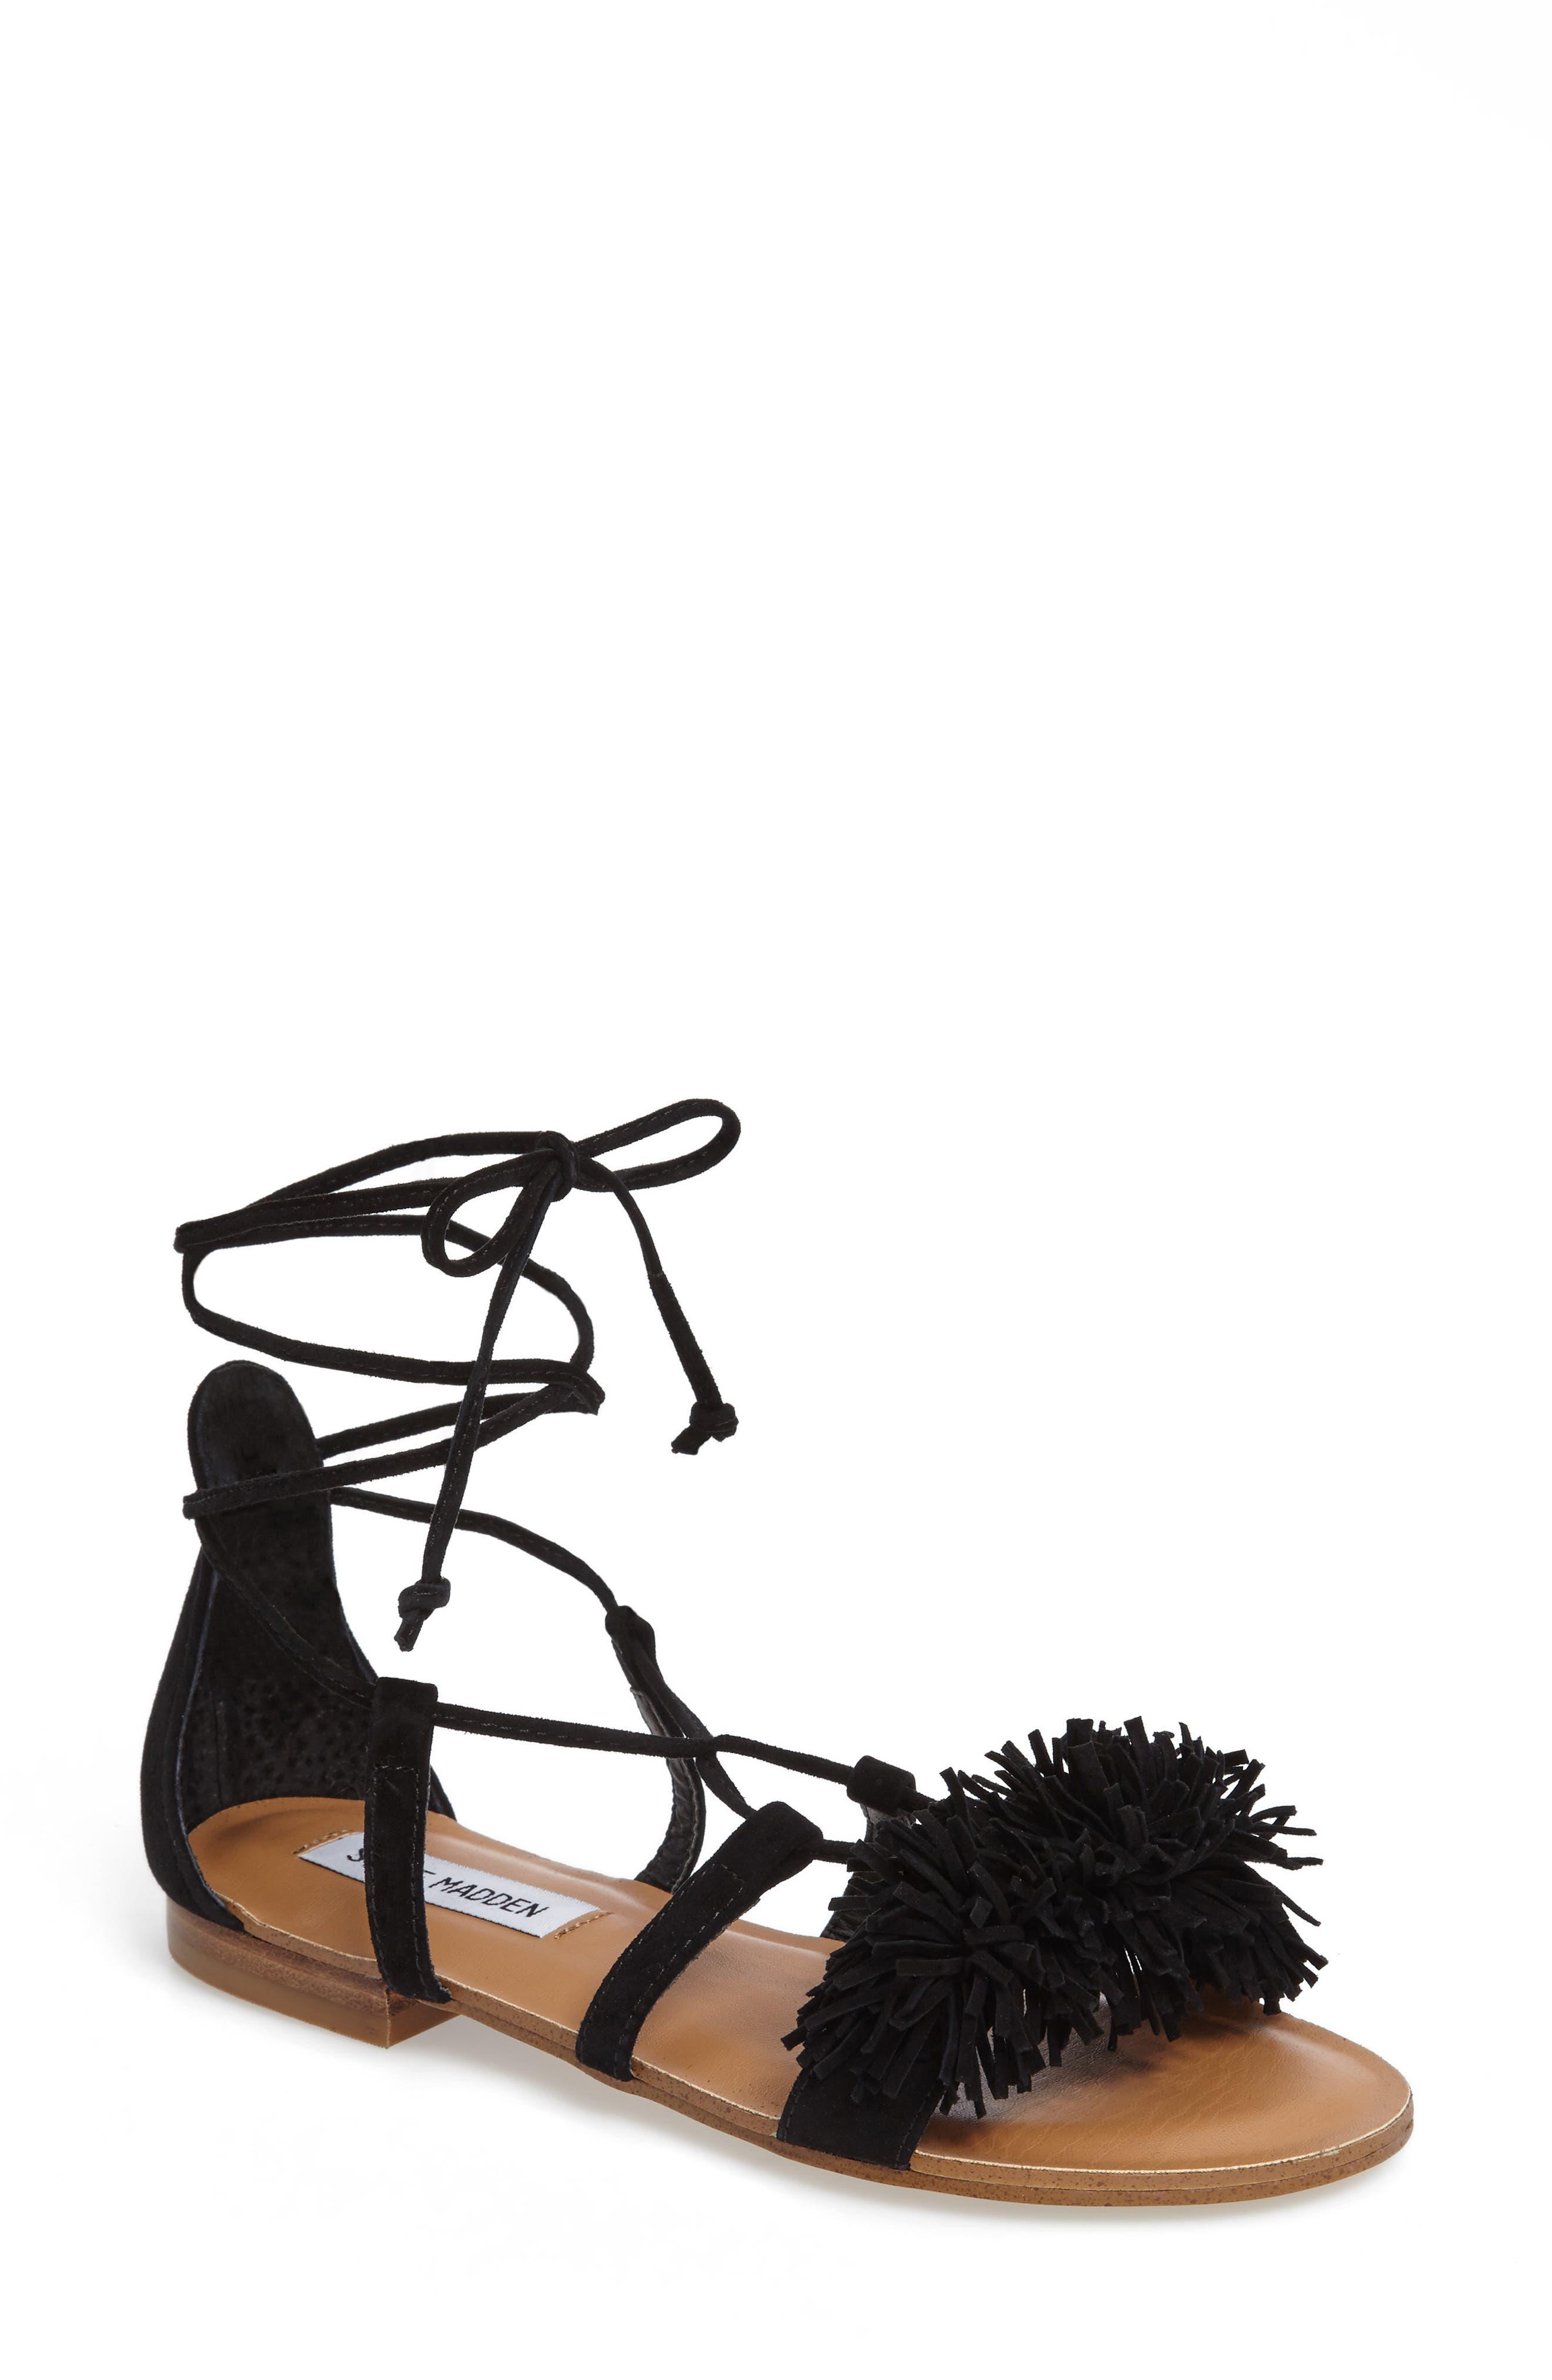 Alternate Image 1 Selected - Steve Madden Swizzle Lace-Up Sandal (Women)